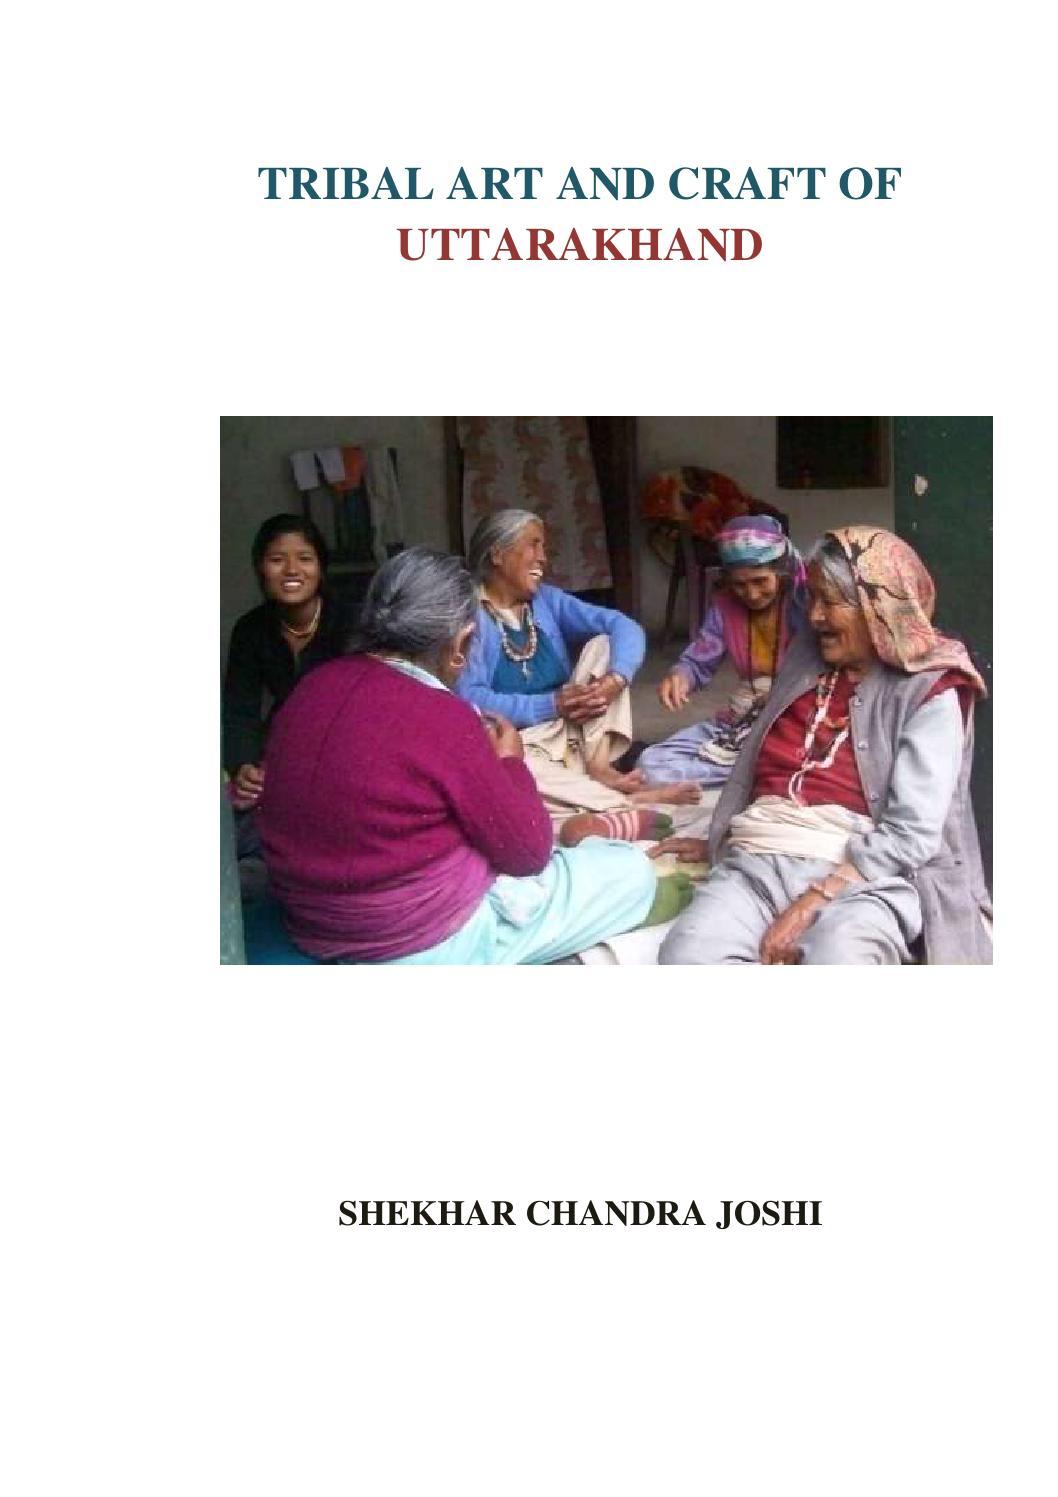 Book on tribal art of uttarakhand by shekhar joshi 2015 by Shekhar ...